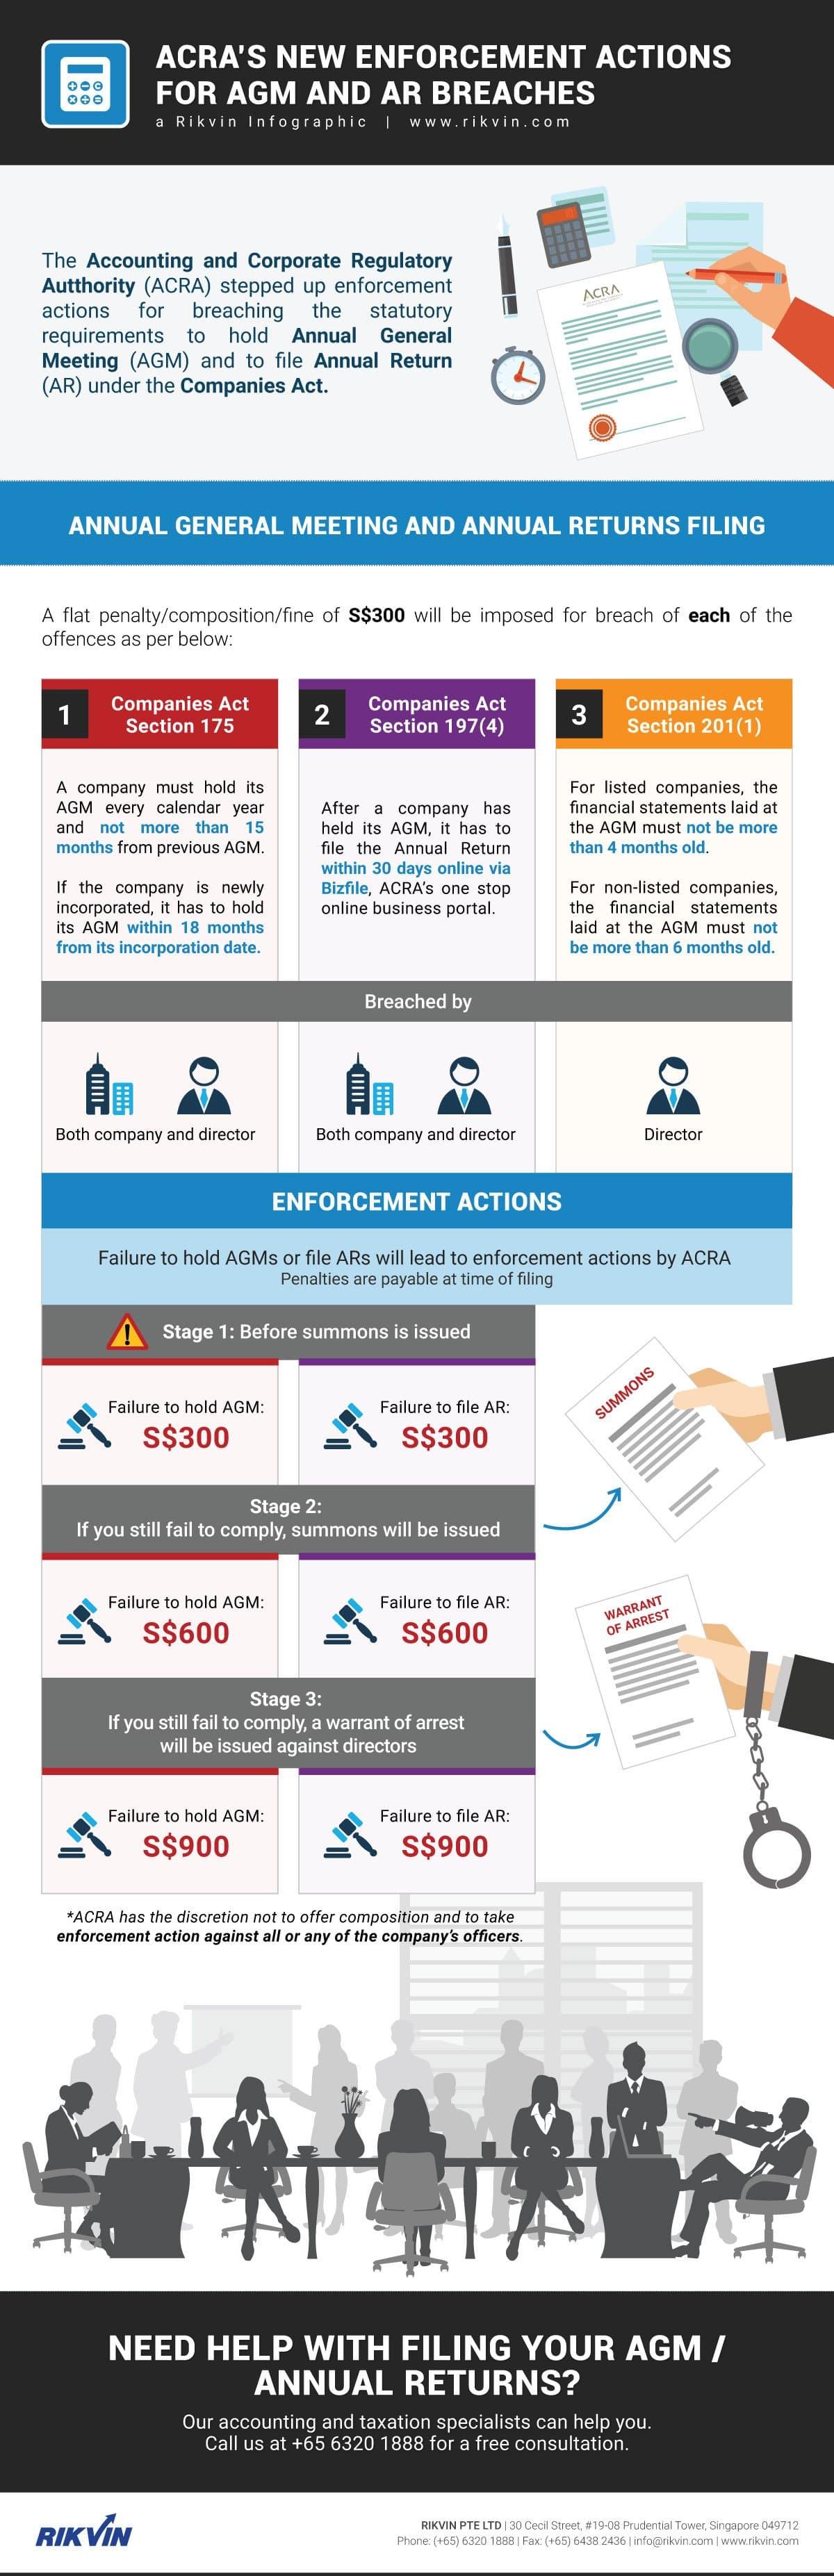 ACRA New Enforcement Actions